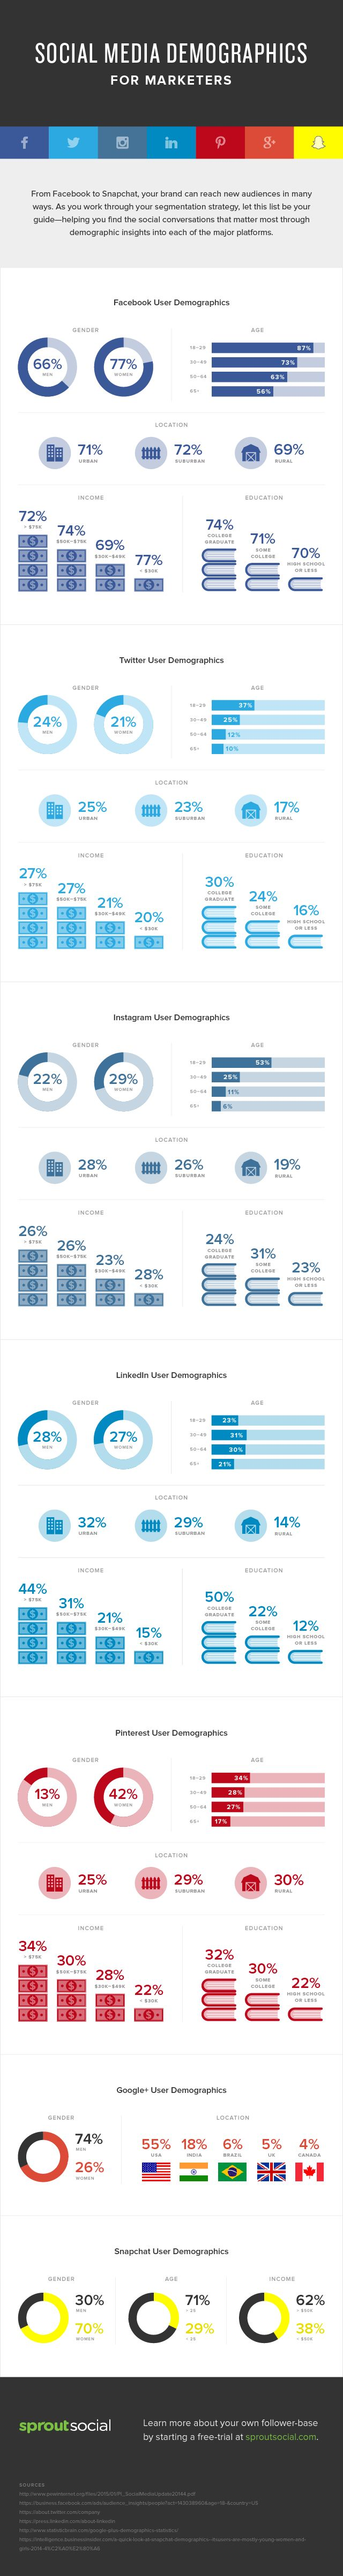 Facebook, Twitter, GooglePlus, Instagram, LinkedIn, Pinterest and Snapchat - #SocialMedia Demographics for Marketers - #infographic